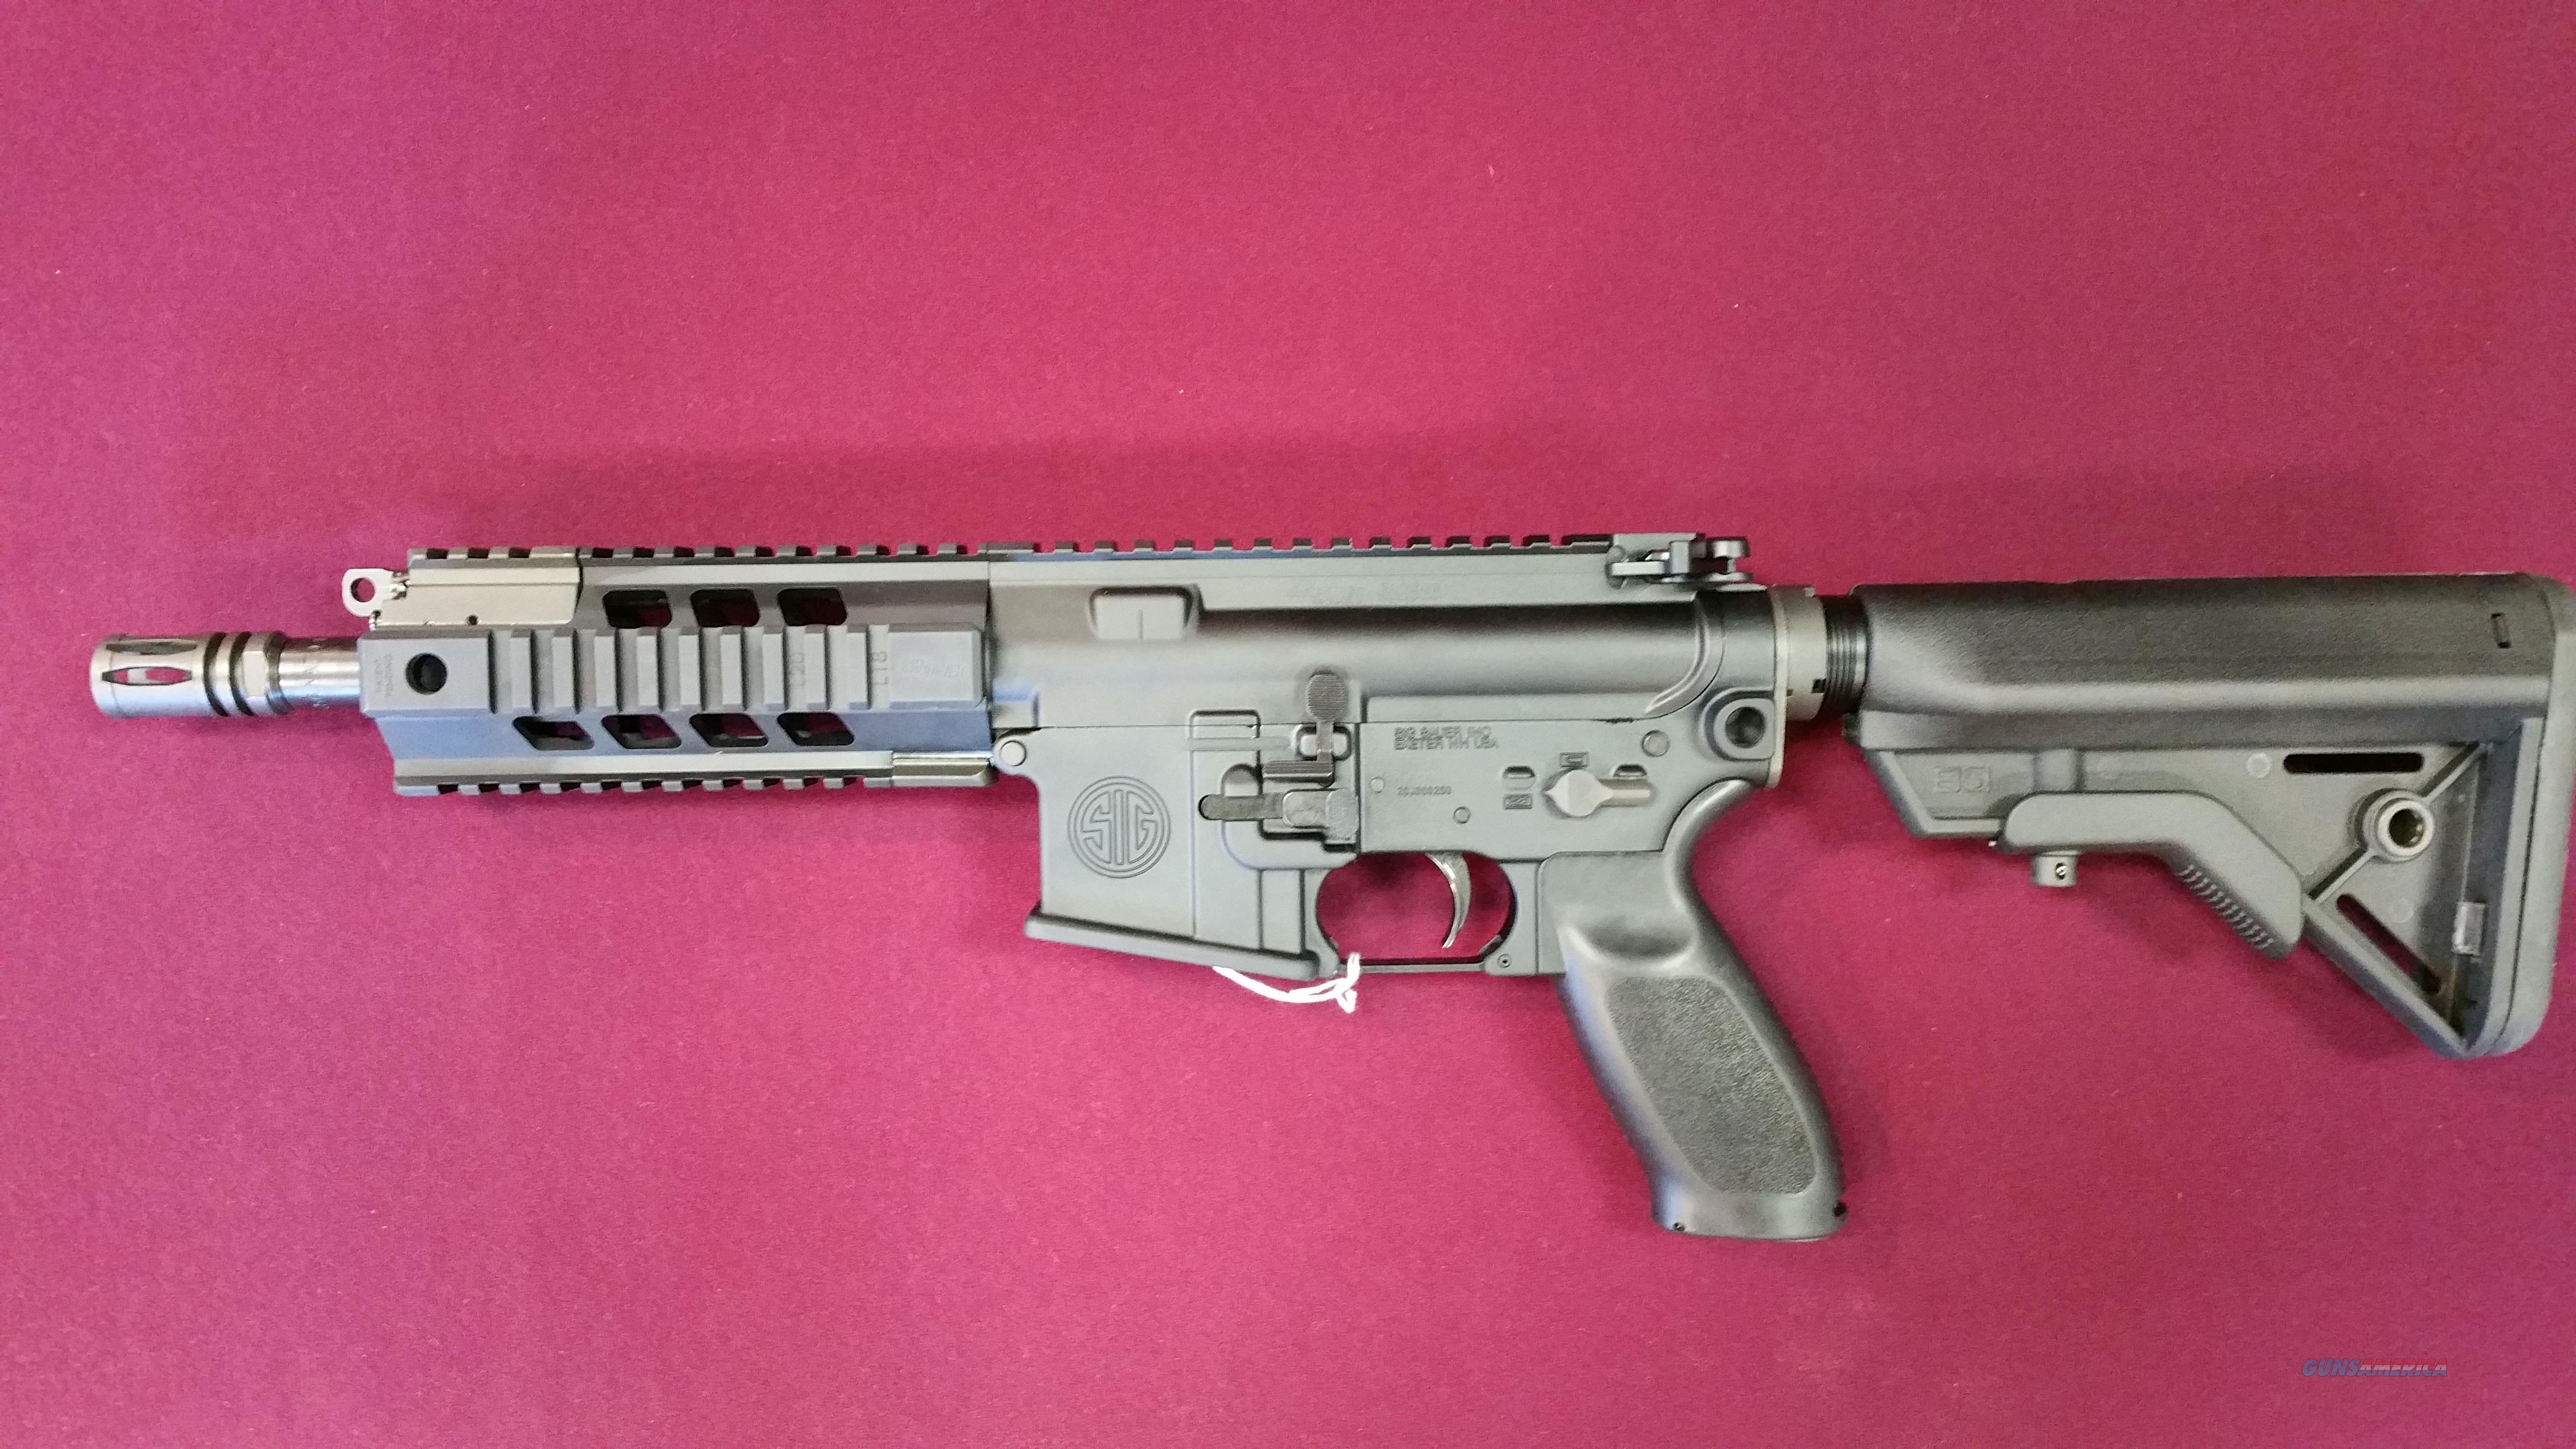 SIG SAUER SIG516 PDW SBR 5.56mm NATO 7.5 Inch Barrel   Guns > Rifles > Sig - Sauer/Sigarms Rifles